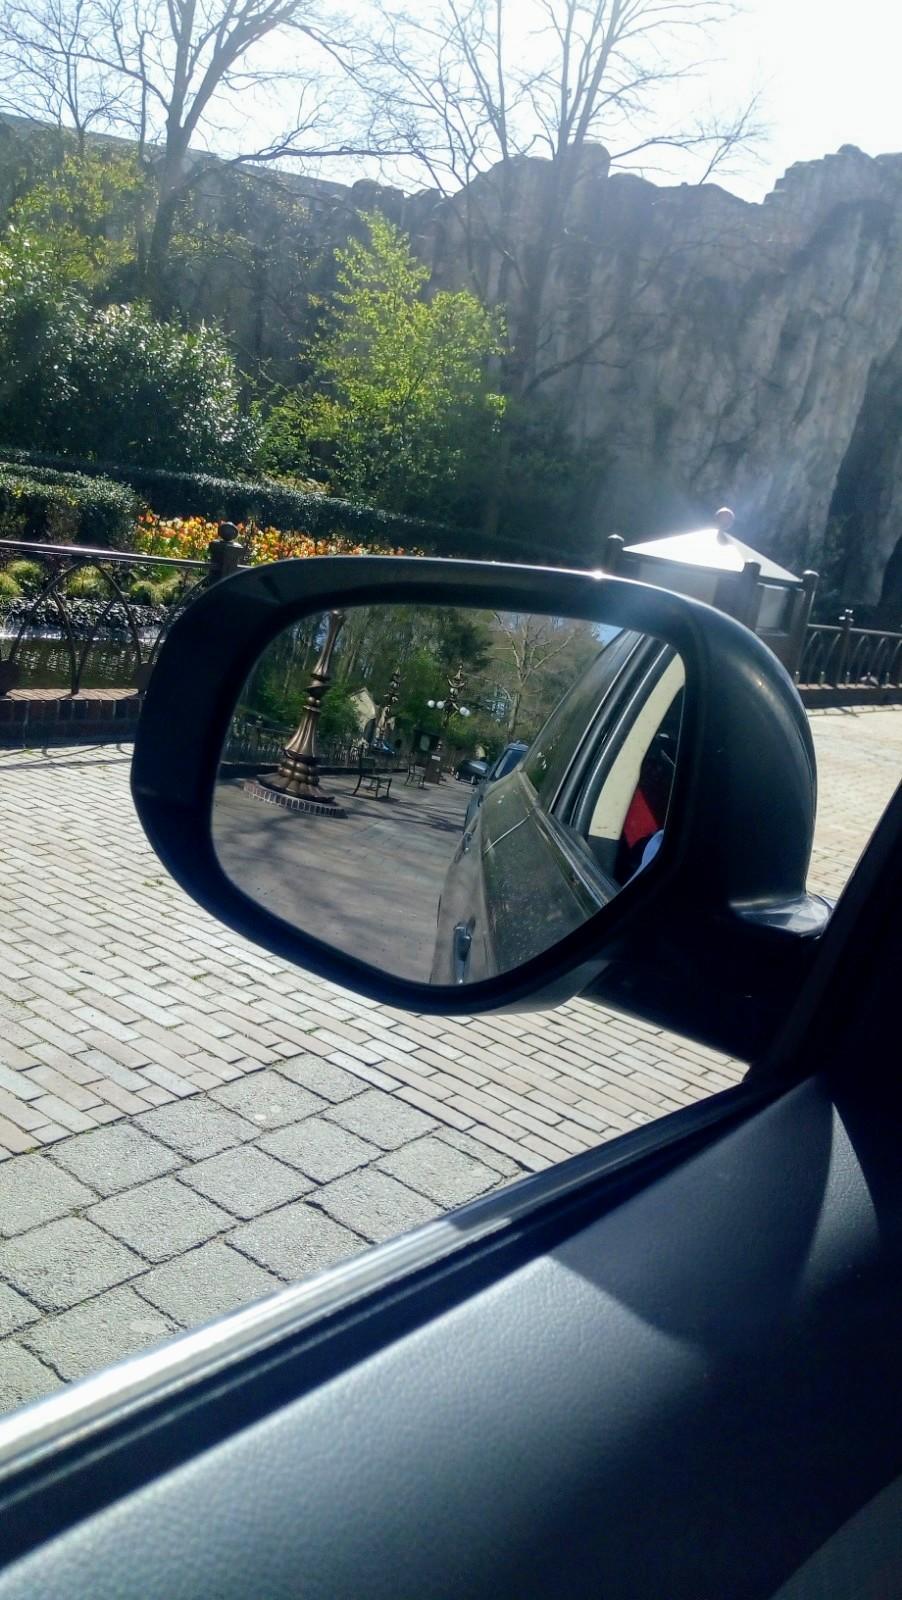 autosafari Efteling, Efteling, met de auto door de Efteling, Efteling personeelsactie, Efteling dicht, Efteling leeg, Efteling park, Efteling tijdens Corona, mamablog, mamalifestyle, lalogblog, lalog, lalog.nl